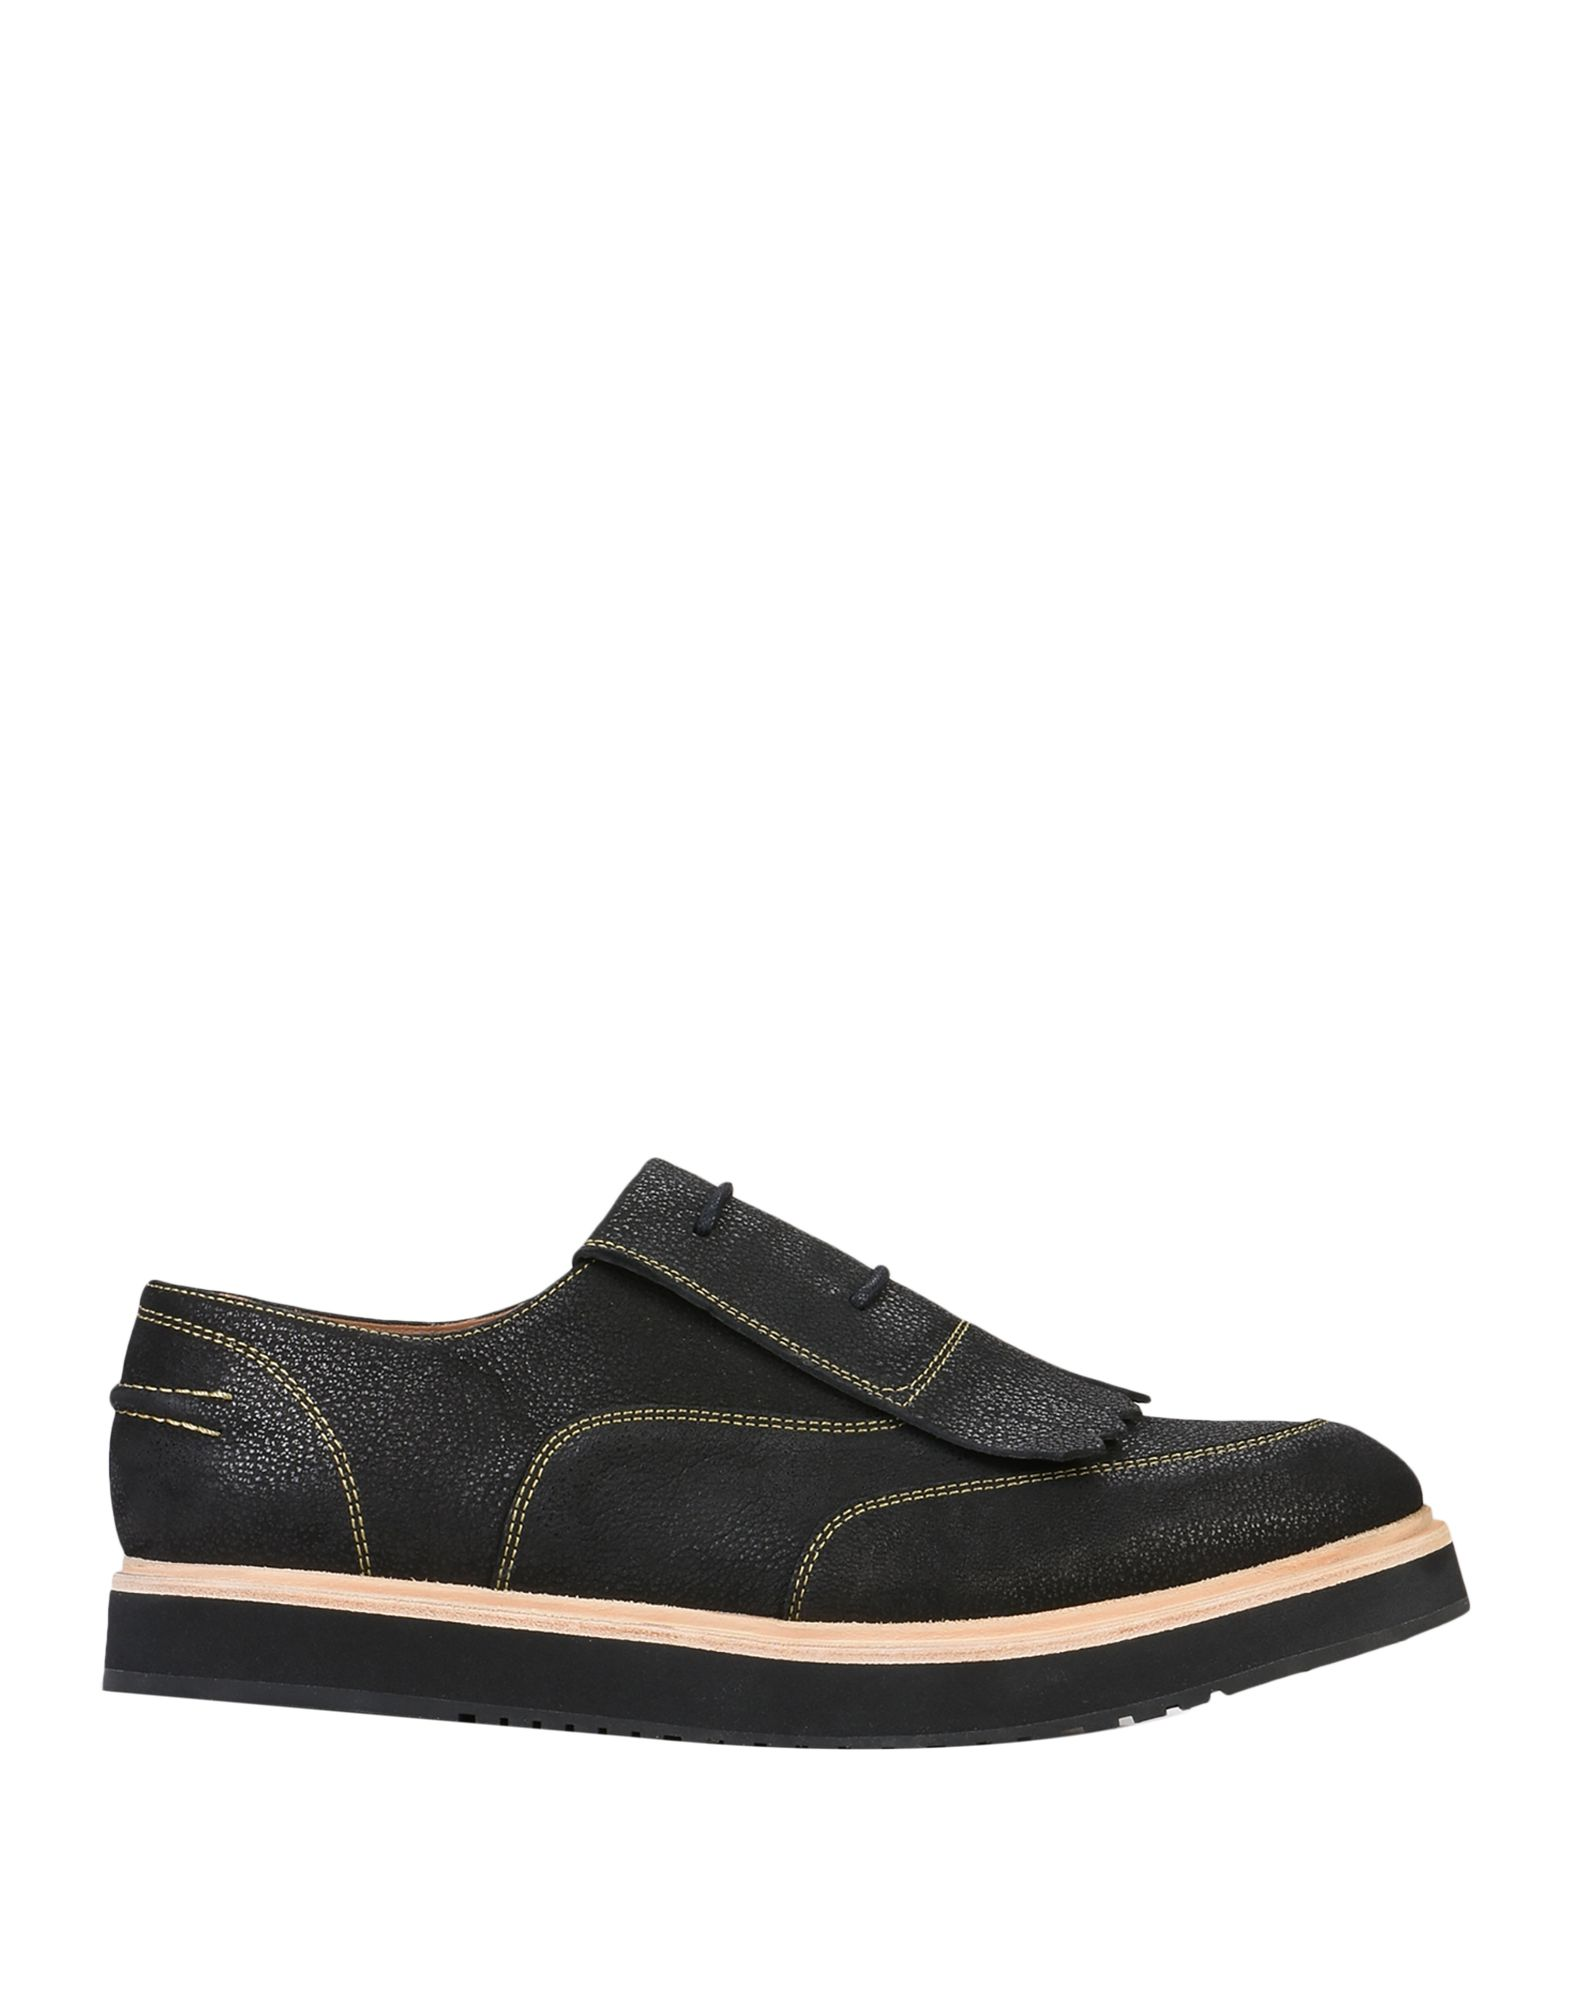 EMPORIO ARMANI Обувь на шнурках